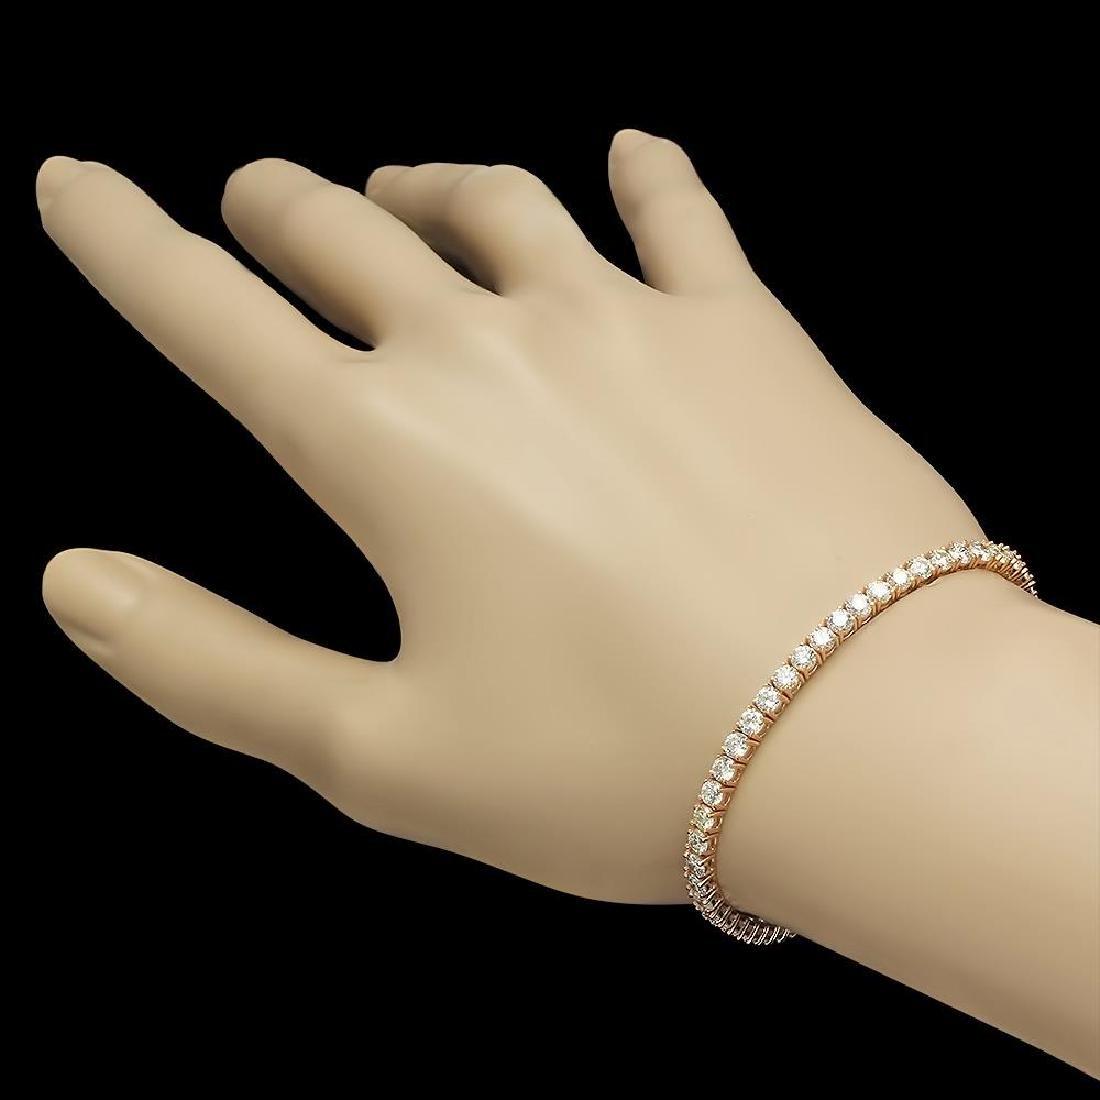 14K Gold 6.28ct Diamond Bracelet - 2